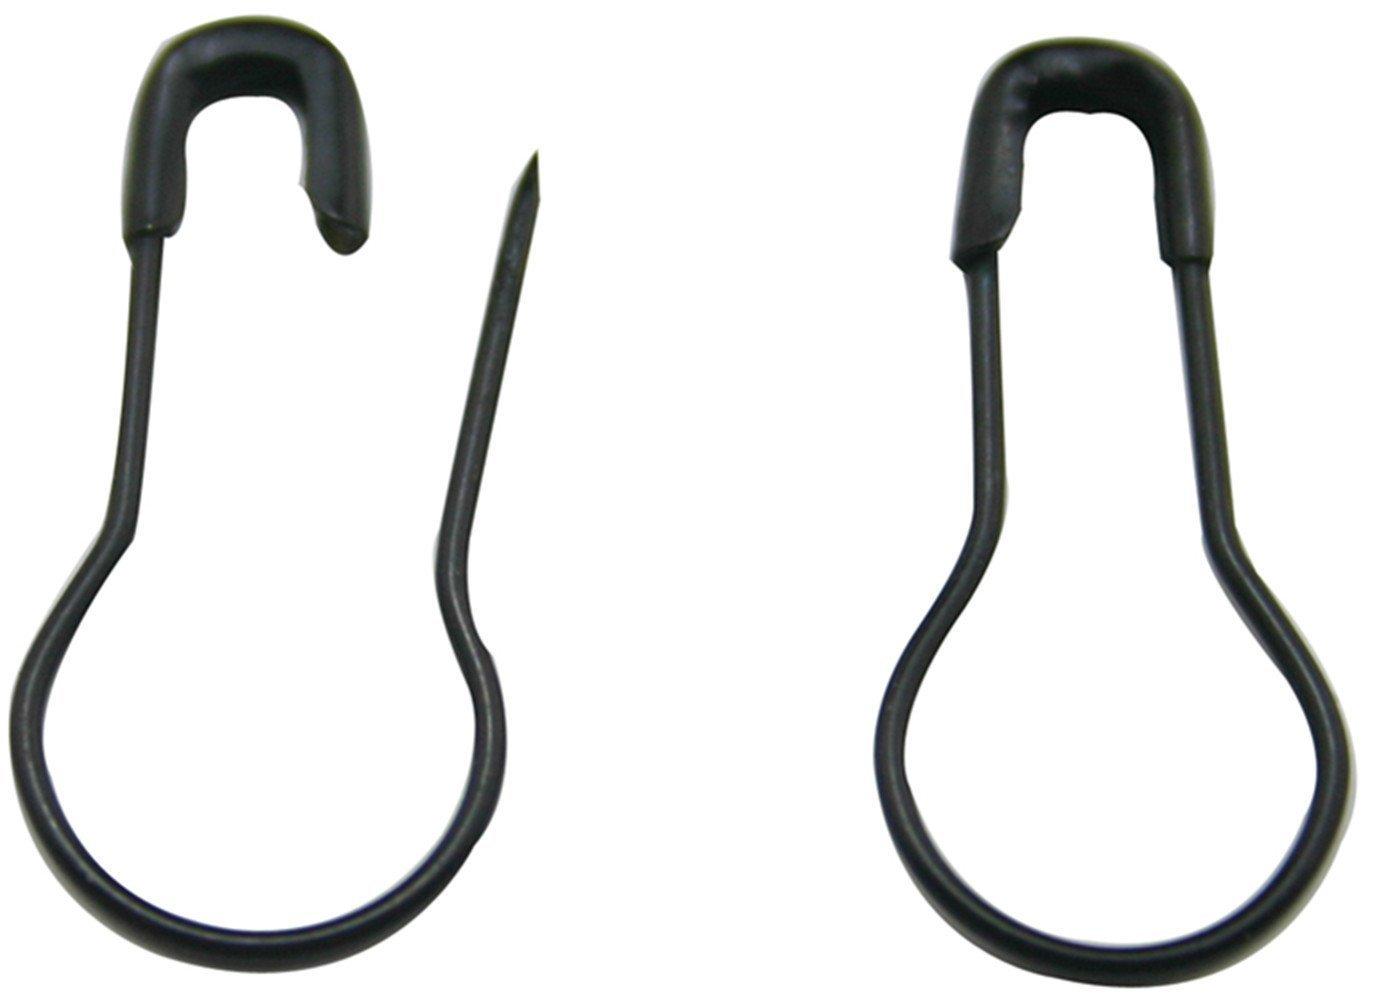 Firefly 1000pcs Gold Metal Gourd Pin//Calabash Pin//Safety Pins//Bulb Pin//Bead Needle Pins//Clothing Tag Pins DIY Home Accessories